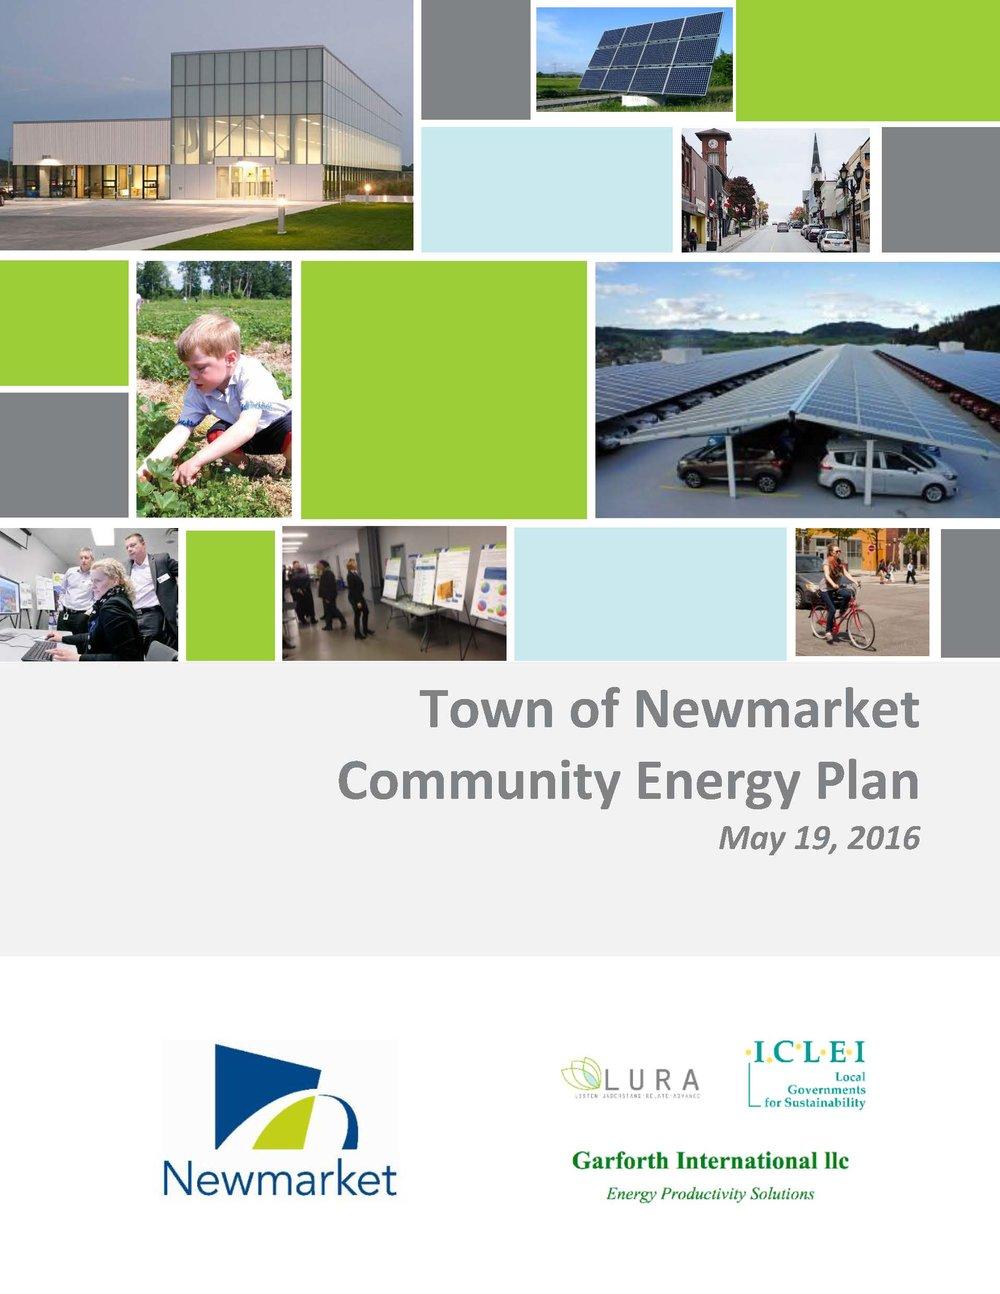 http://www.newmarket.ca/LivingHere/Documents/Planning%20Department/Community%20Energy%20Plan/Newmarket%20Community%20Energy%20Plan.pdf